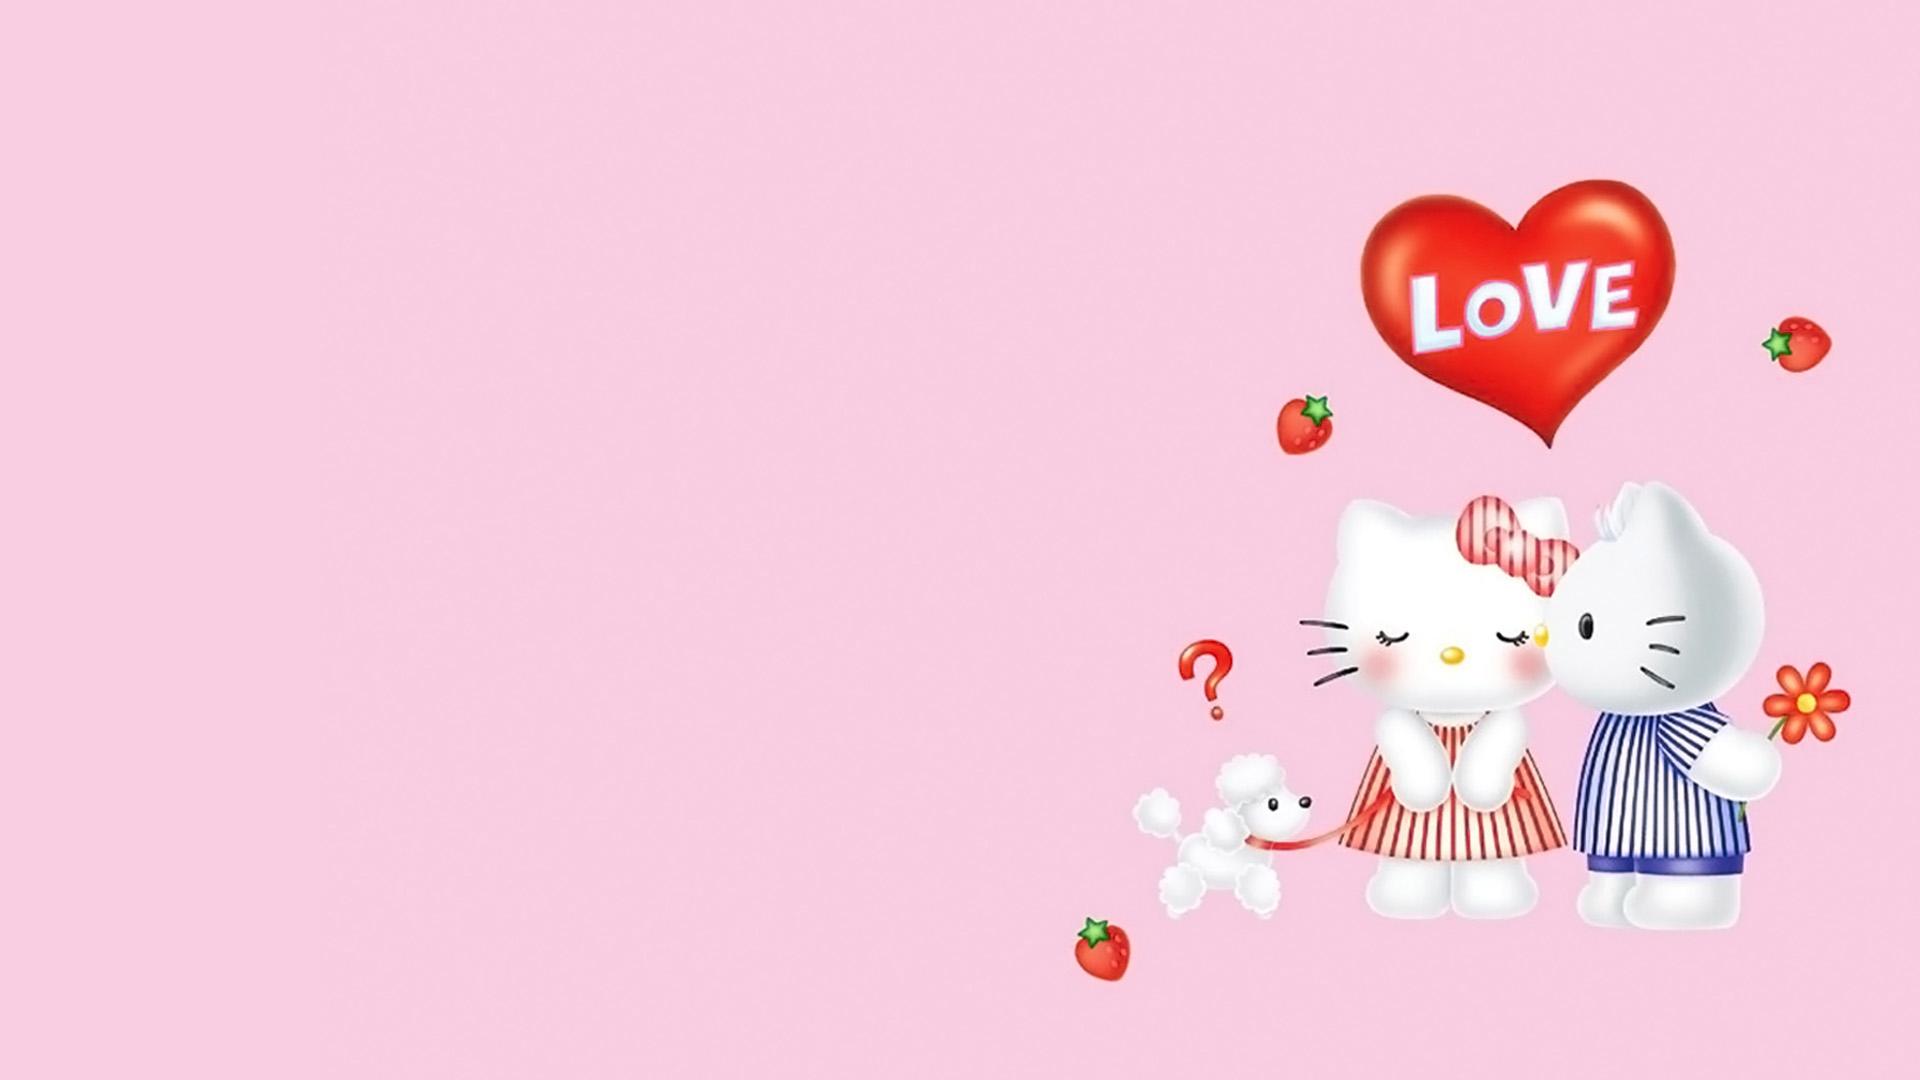 Popular Wallpaper Hello Kitty Nurse - 2l1X7Q  Trends_19603.jpg